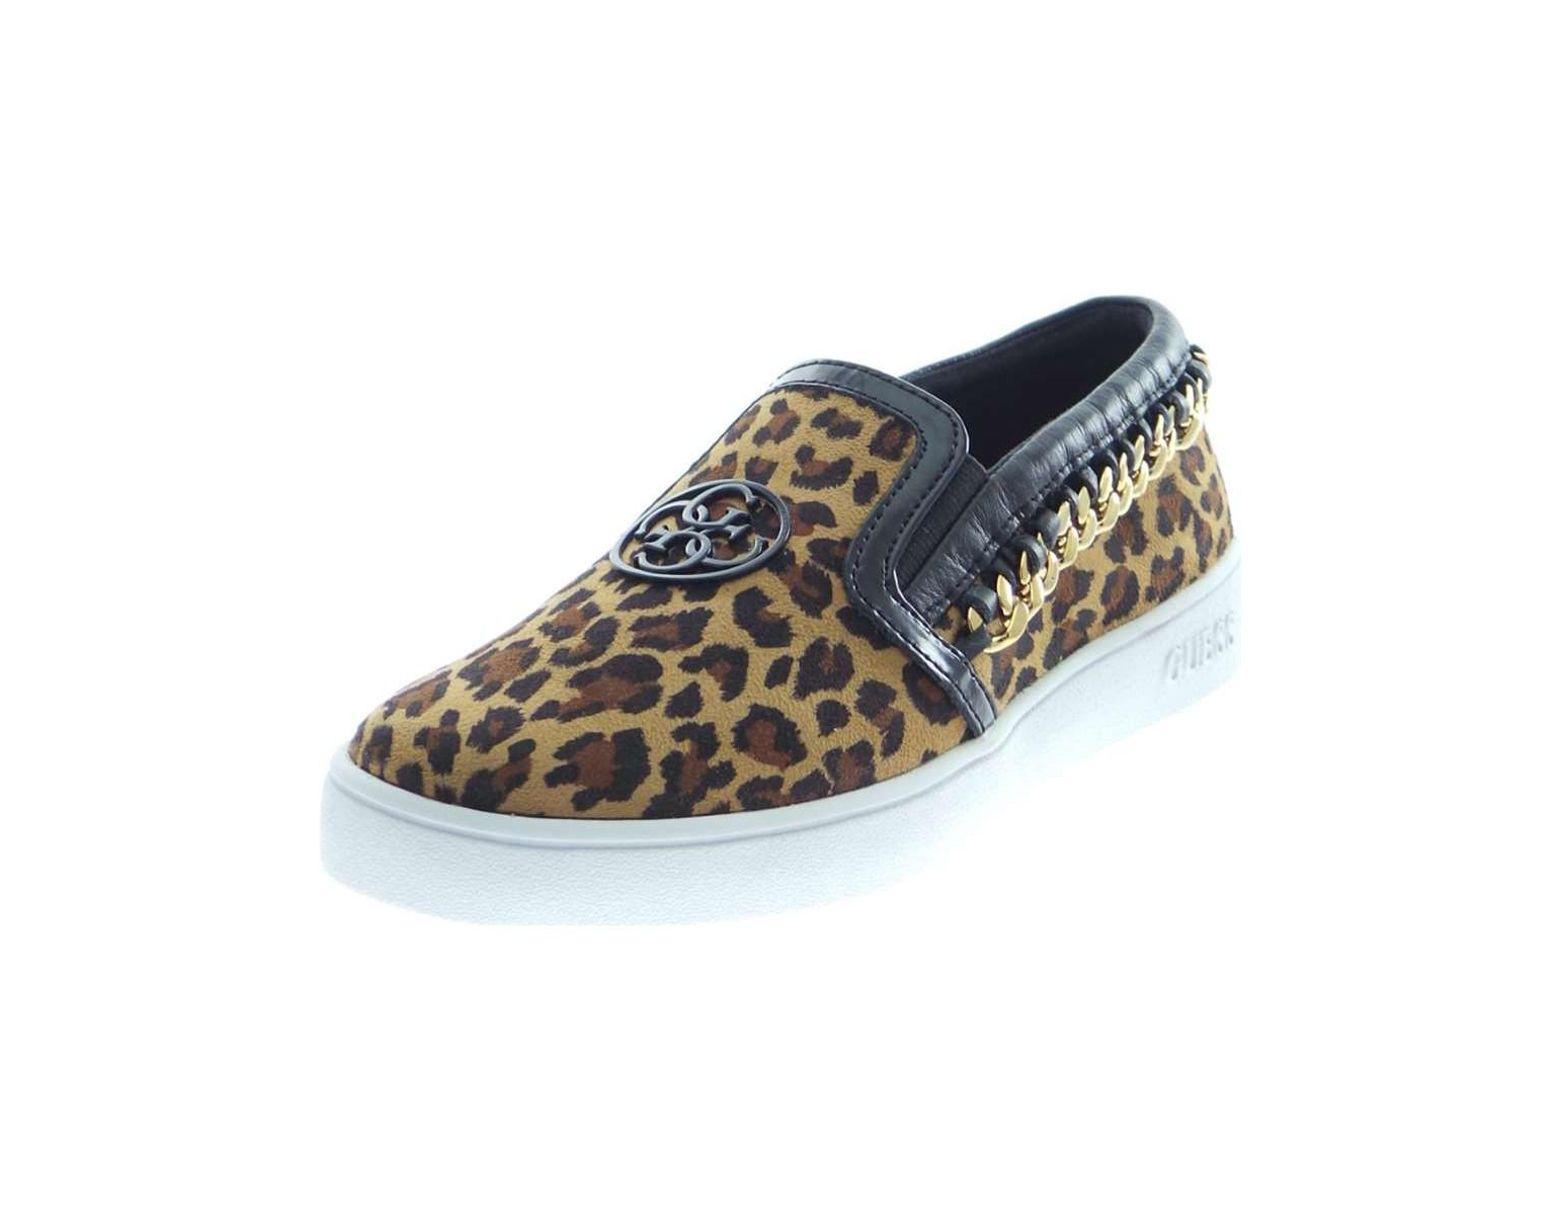 Guess Marjin Baskets Basses Femme Noir Chaussures Sneakers